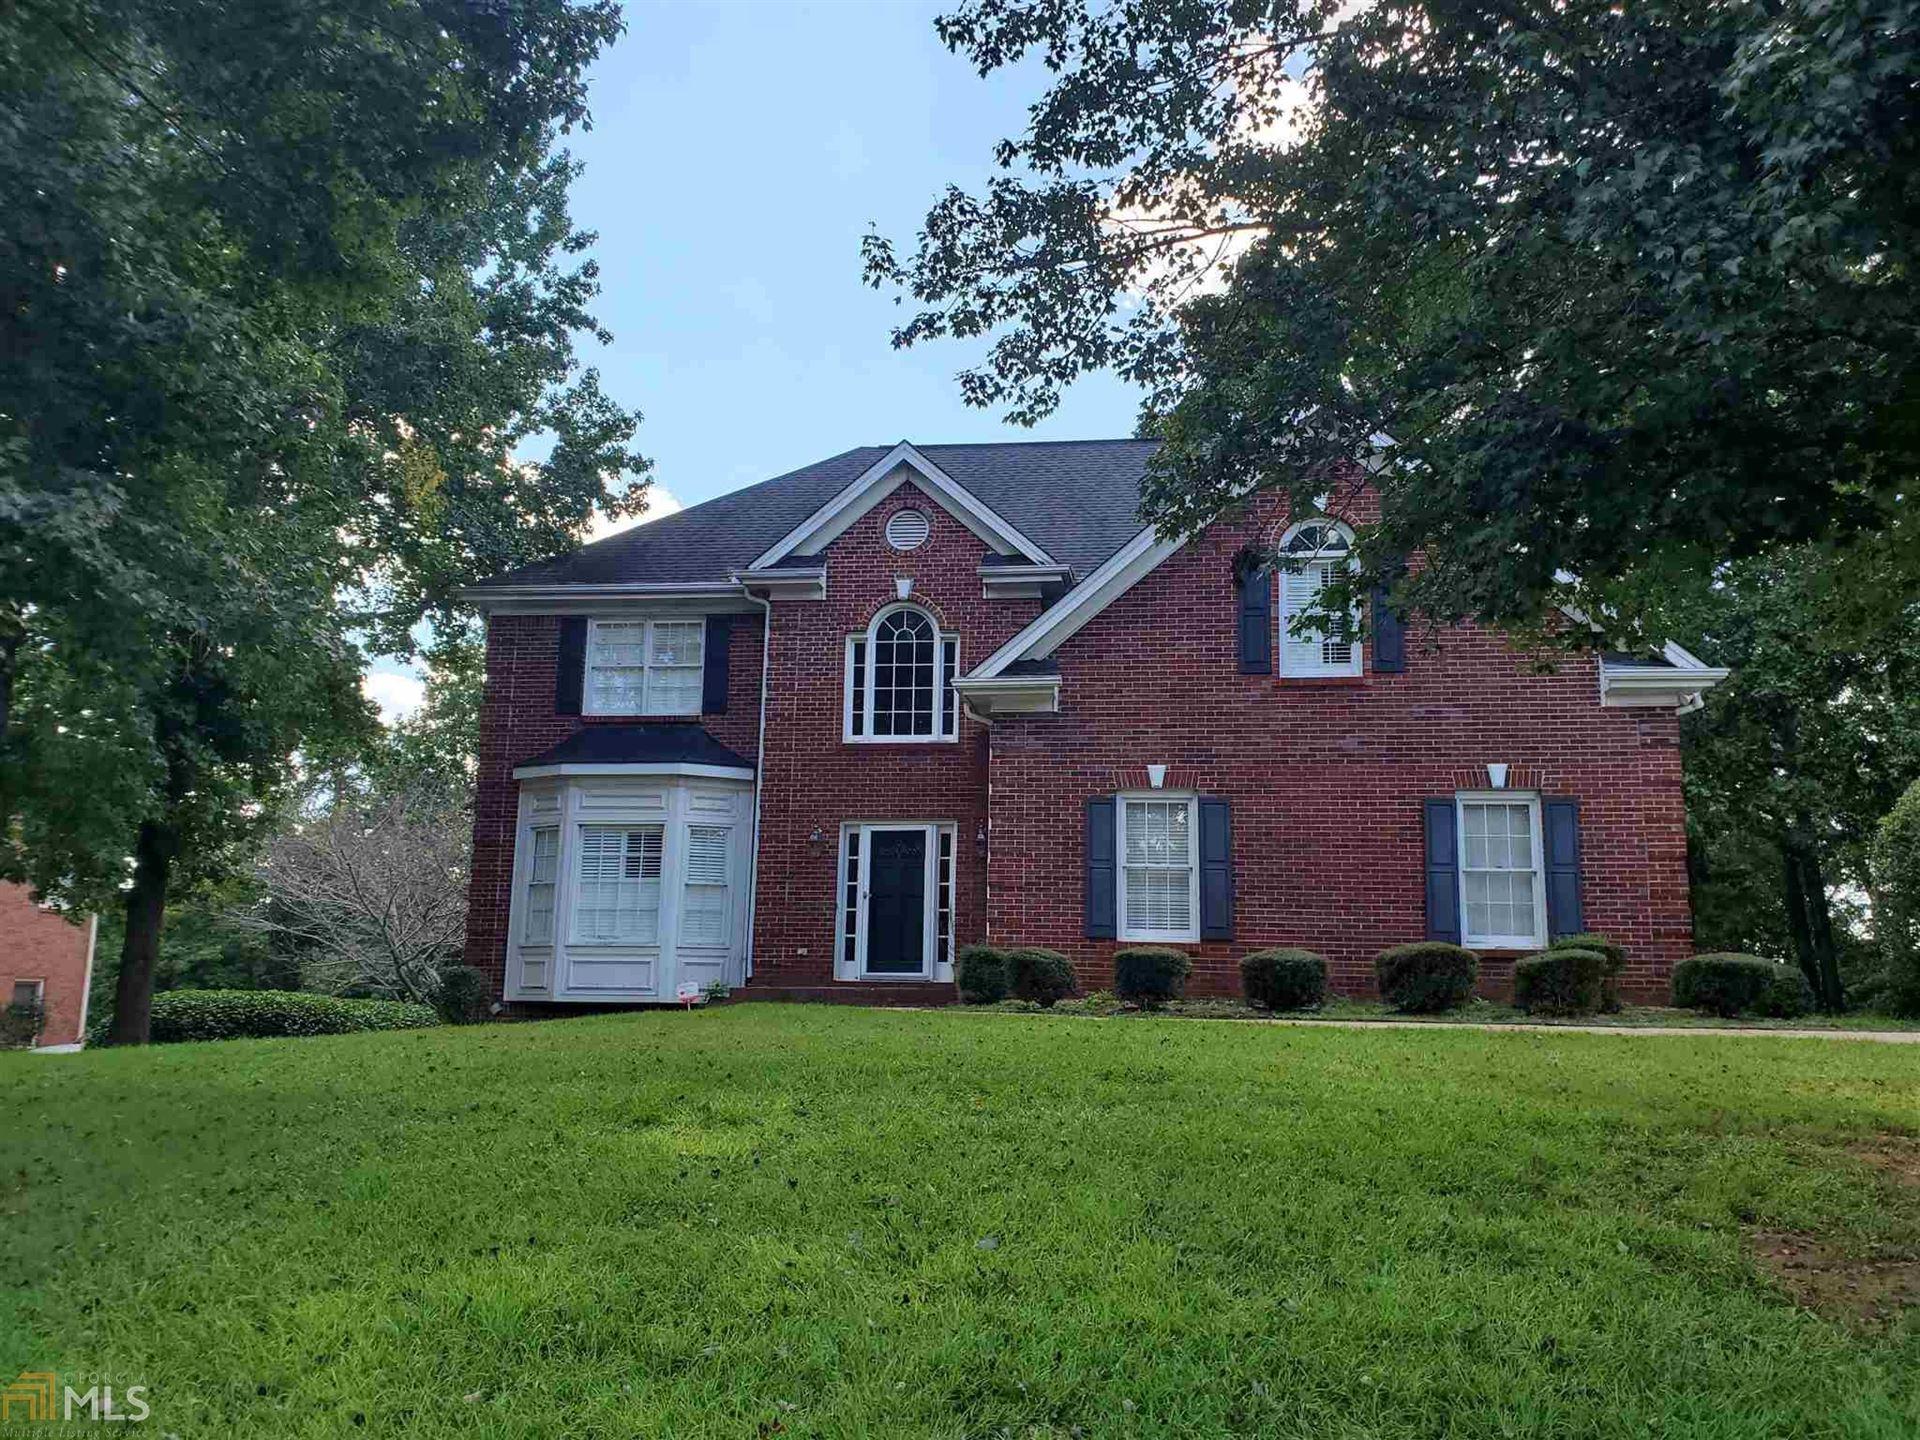 2311 Weldon Rd, Conyers, GA 30094 - MLS#: 8882687